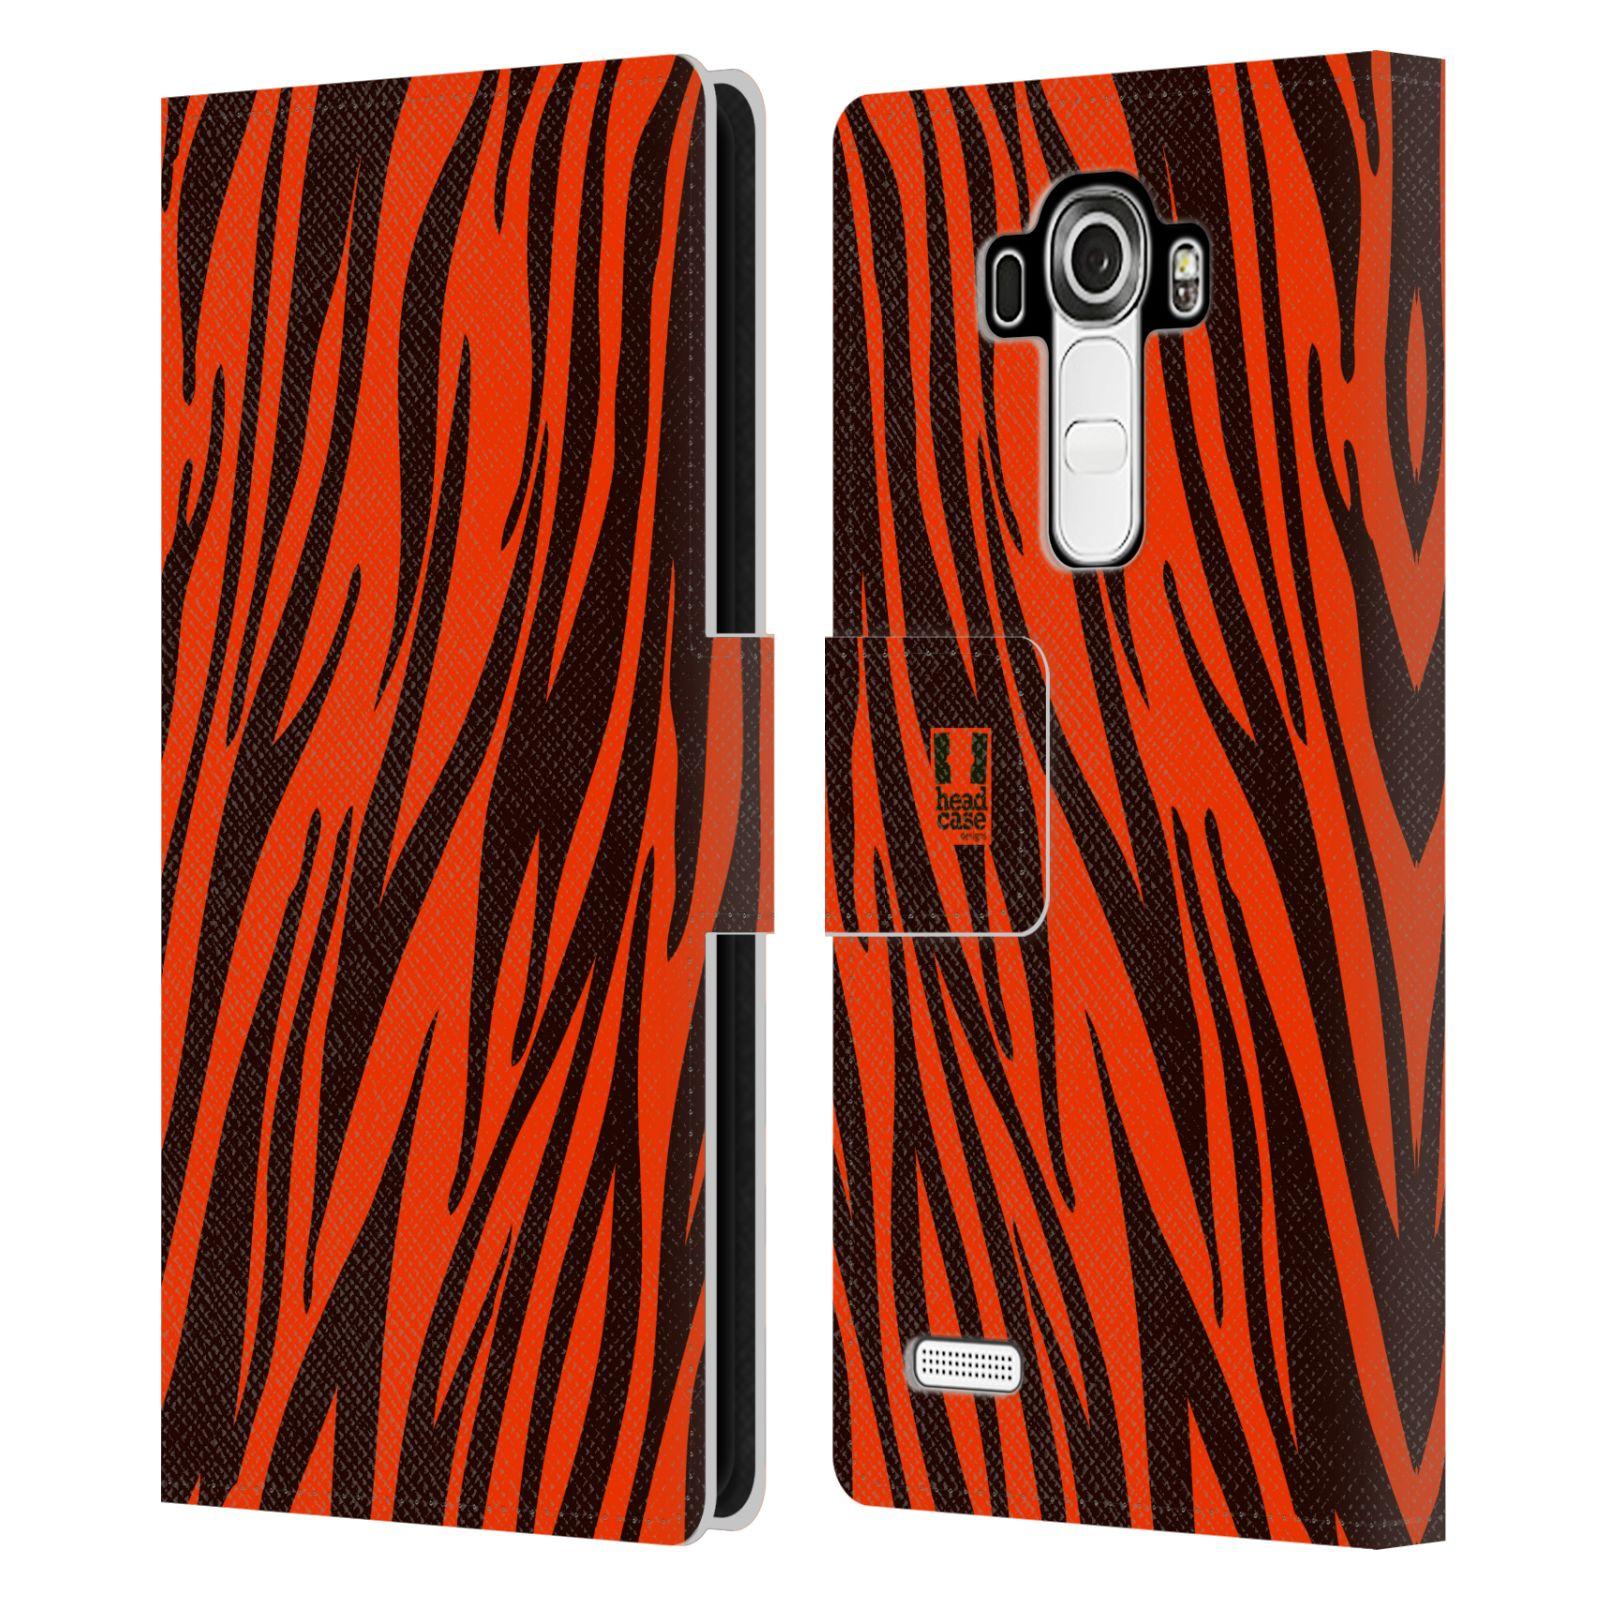 HEAD CASE Flipové pouzdro pro mobil LG G4 (H815) Zvířecí barevné vzory oranžový tygr